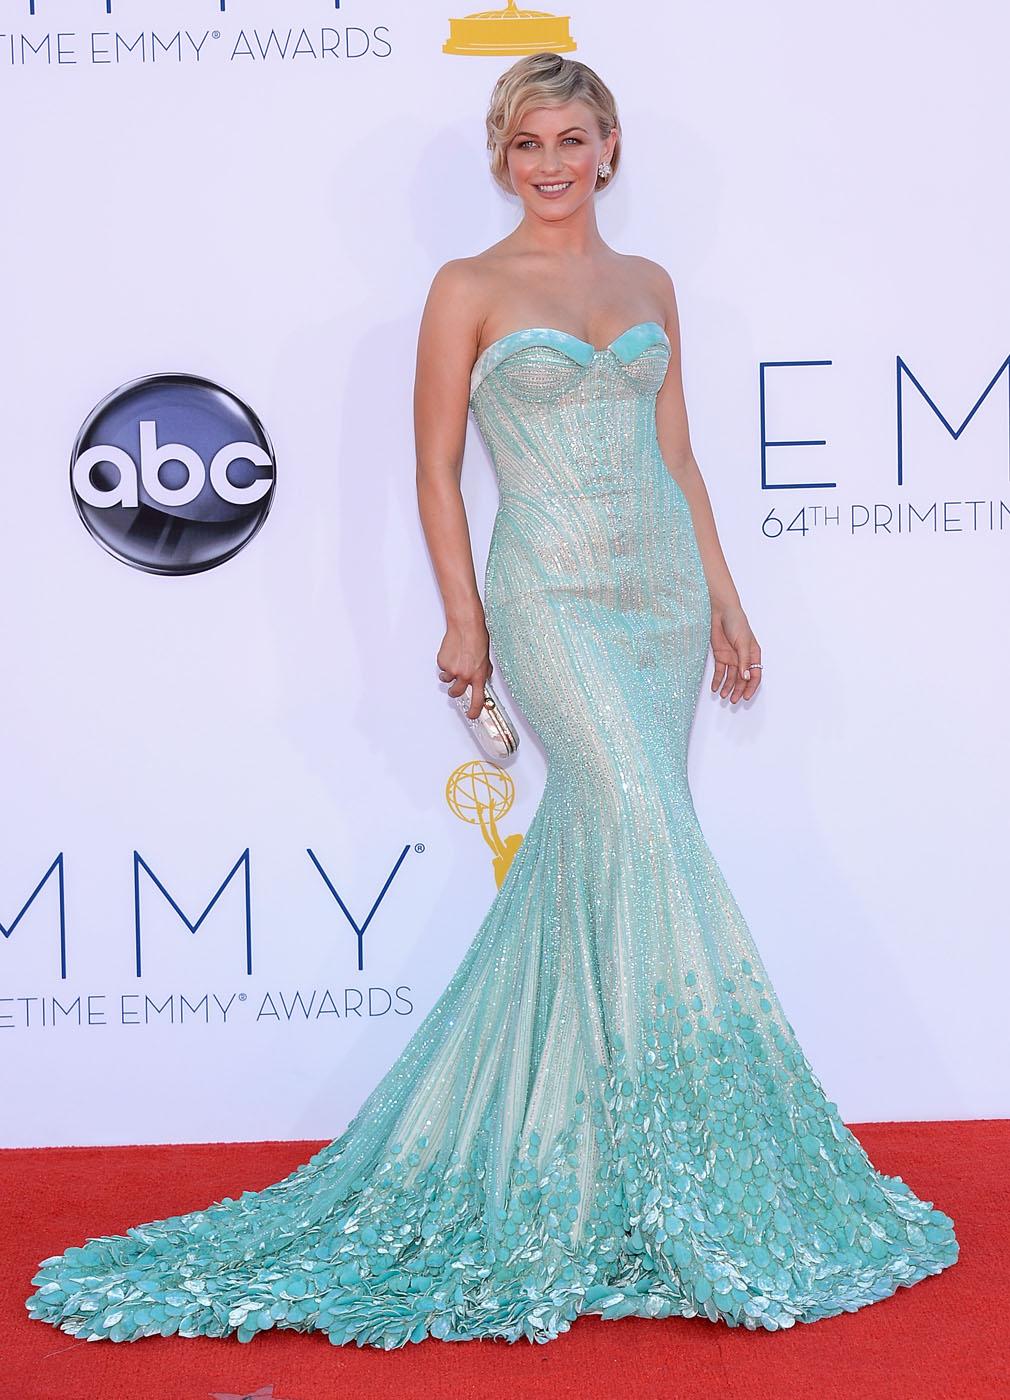 Julianne Hough - 2012 Emmy Awards, Red Carpet Looks